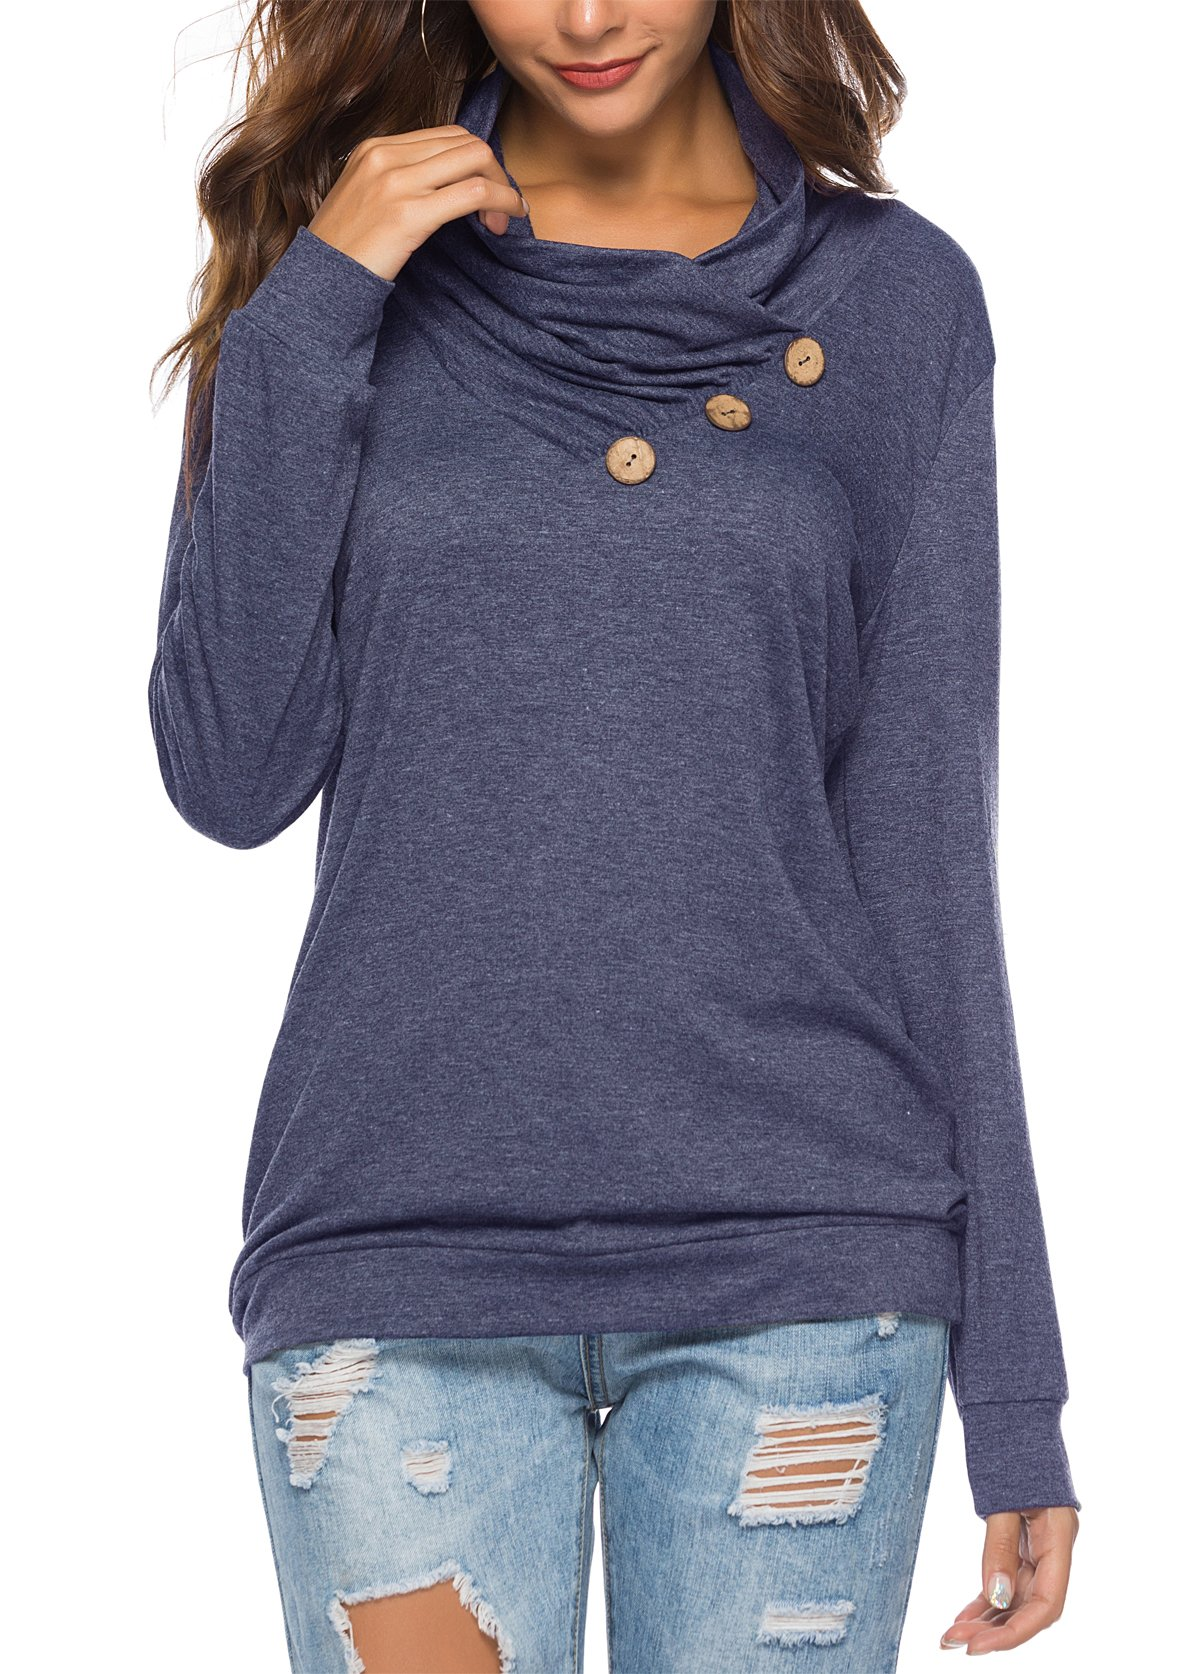 KISSMODA Blue T-Shirt for Women Fashion Cowl Neck